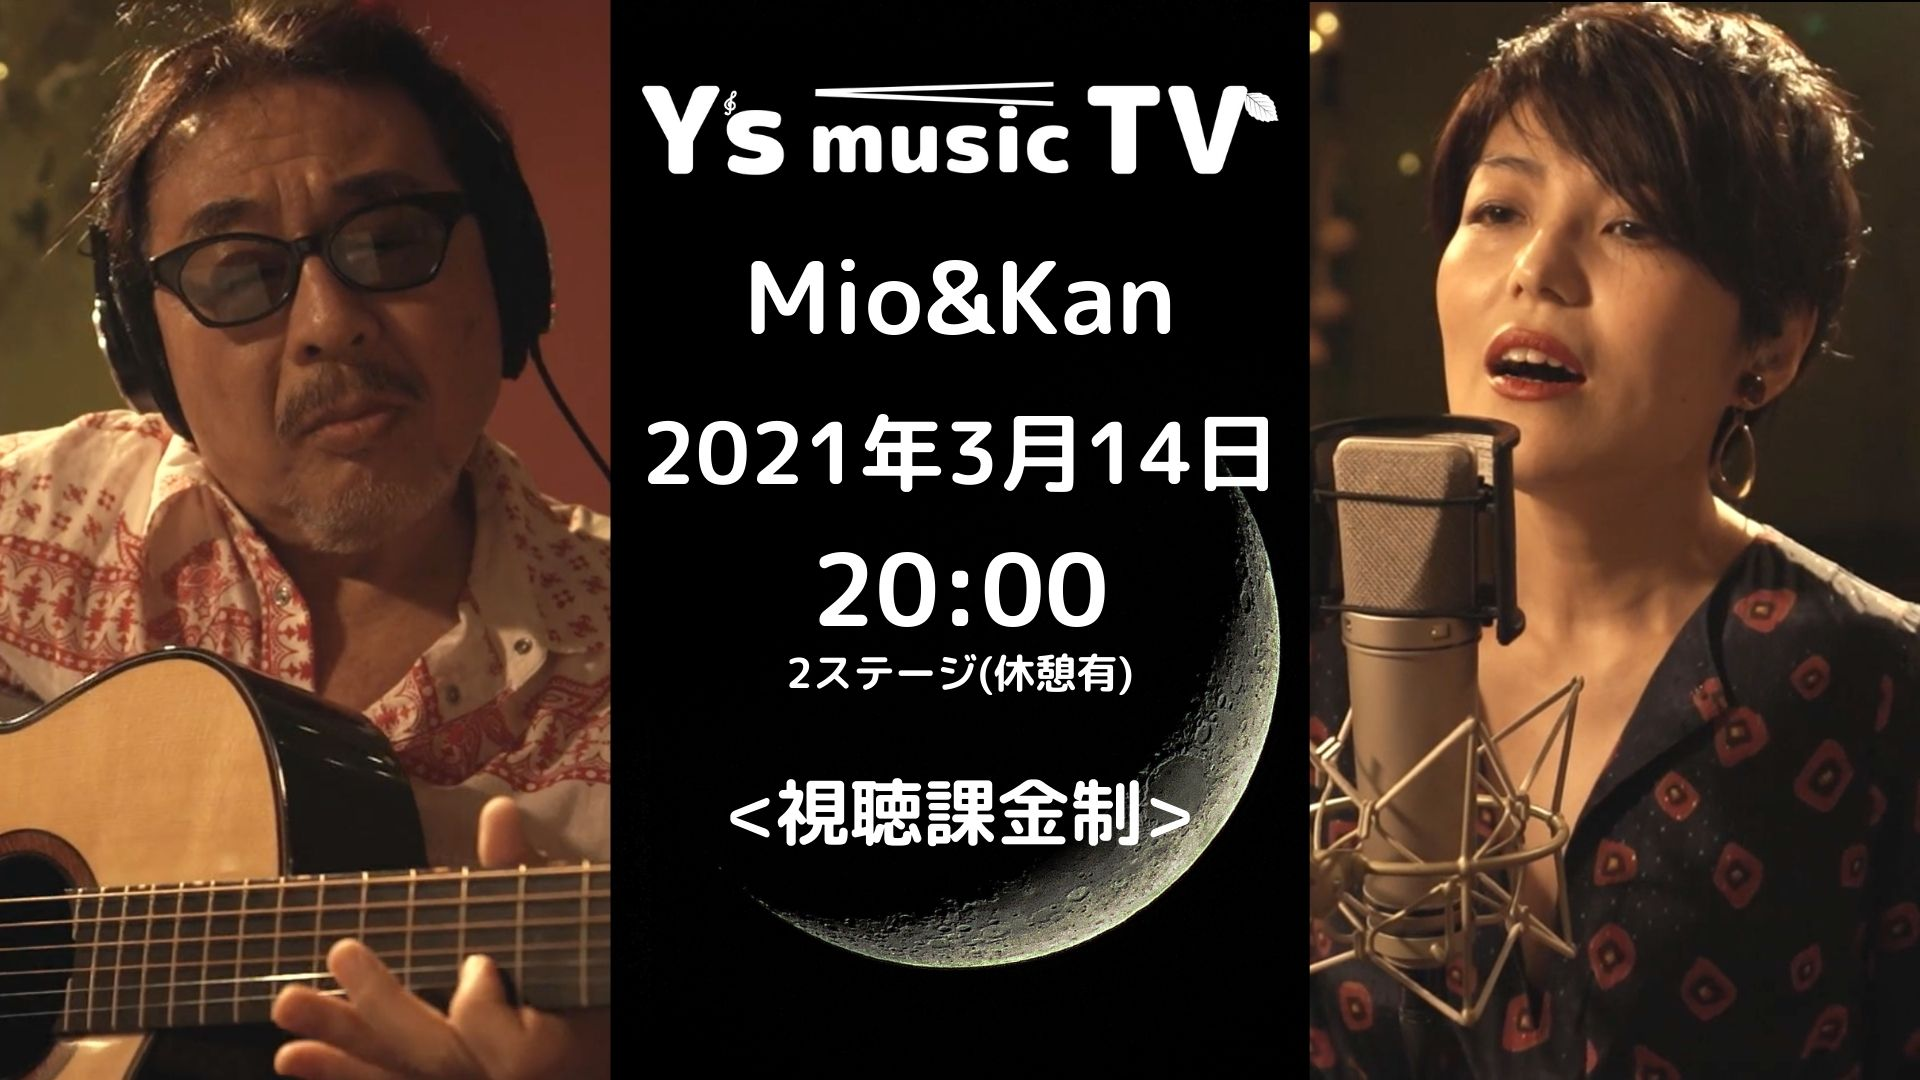 Mio&Kan 本日LIVE配信